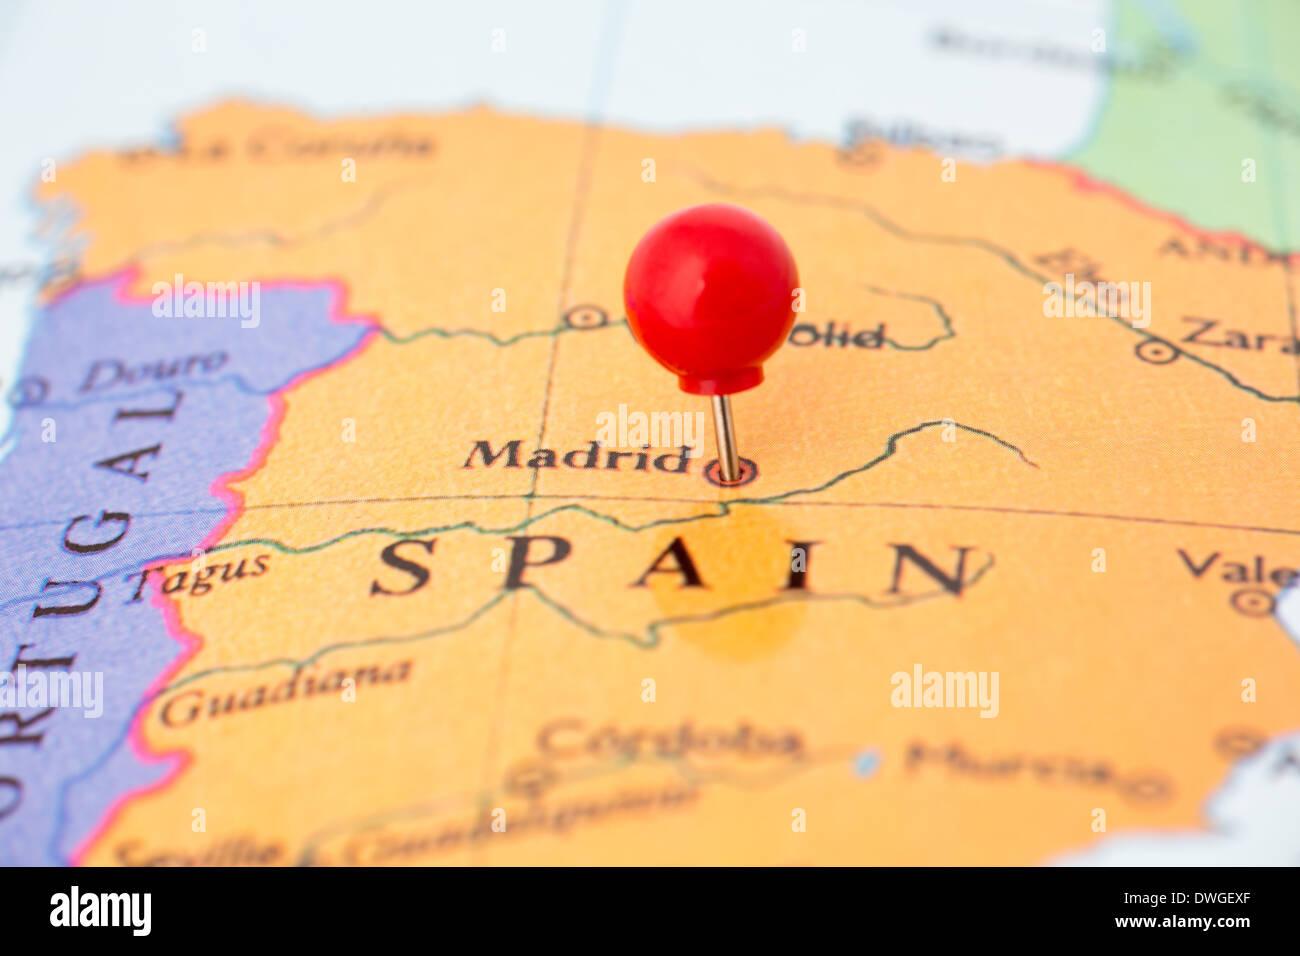 Madrid Capital De España Mapa.Madrid On Map Imagenes De Stock Madrid On Map Fotos De